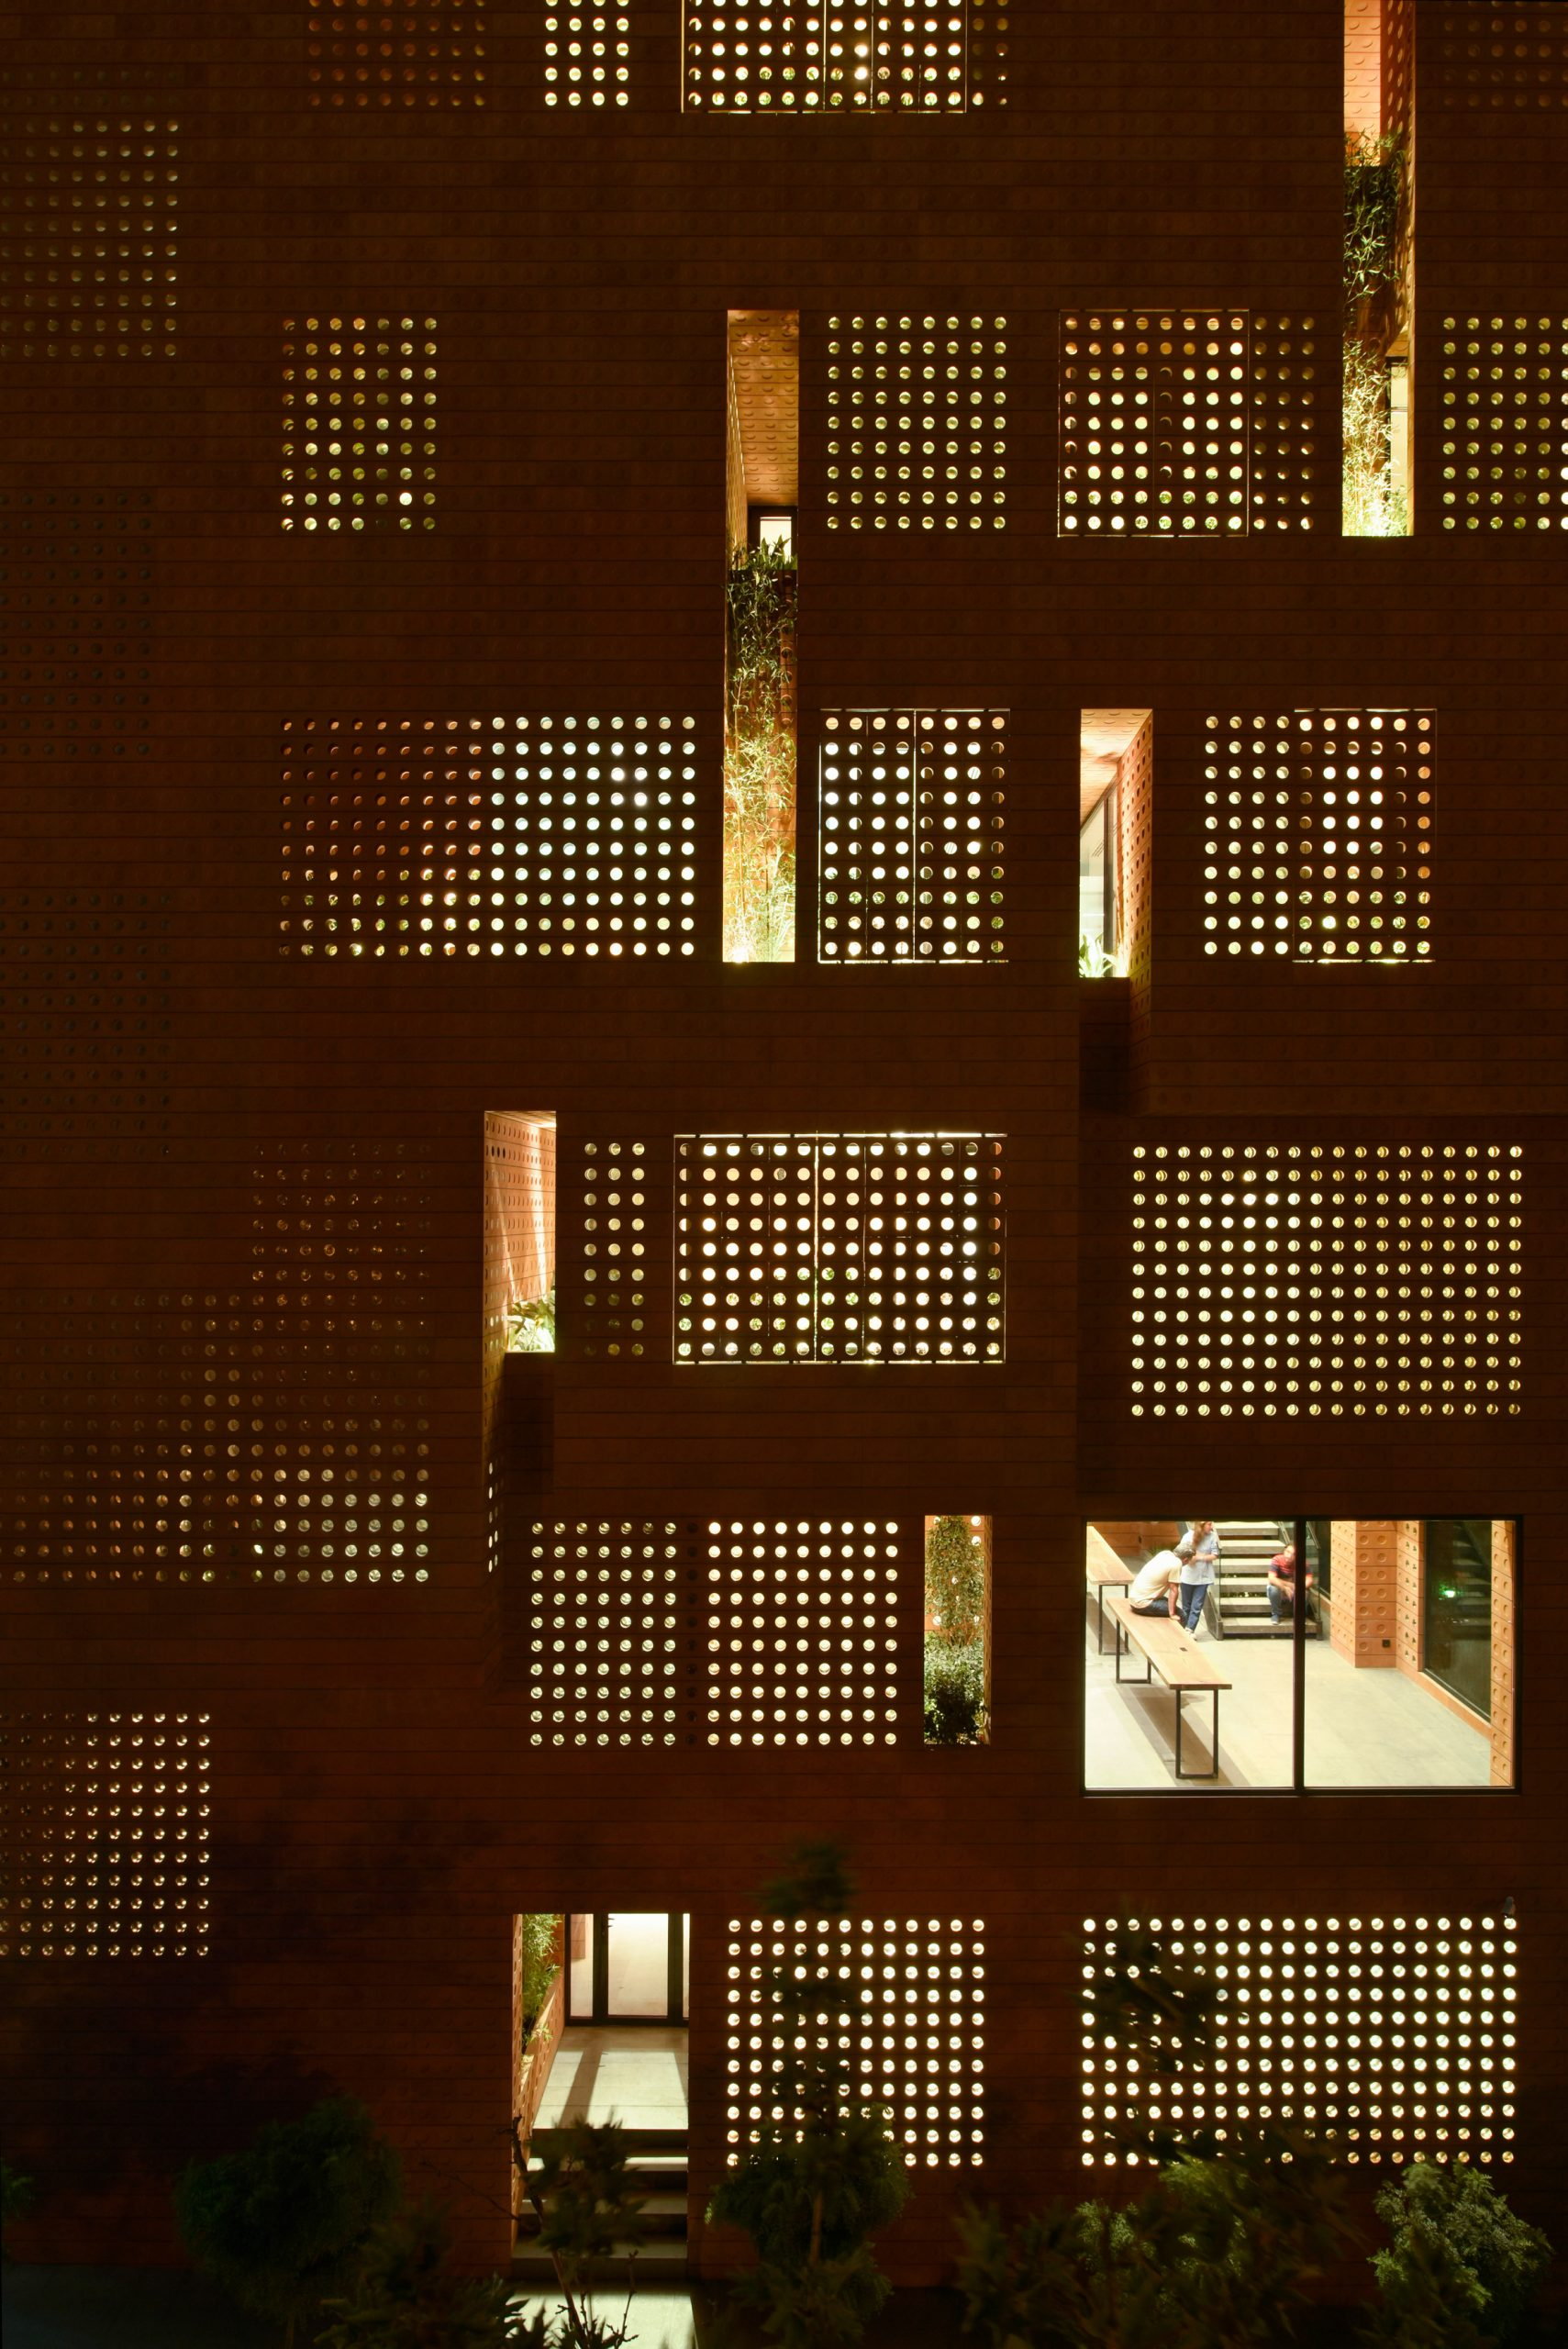 Kohan Ceram headquarters by Hooba Design Group